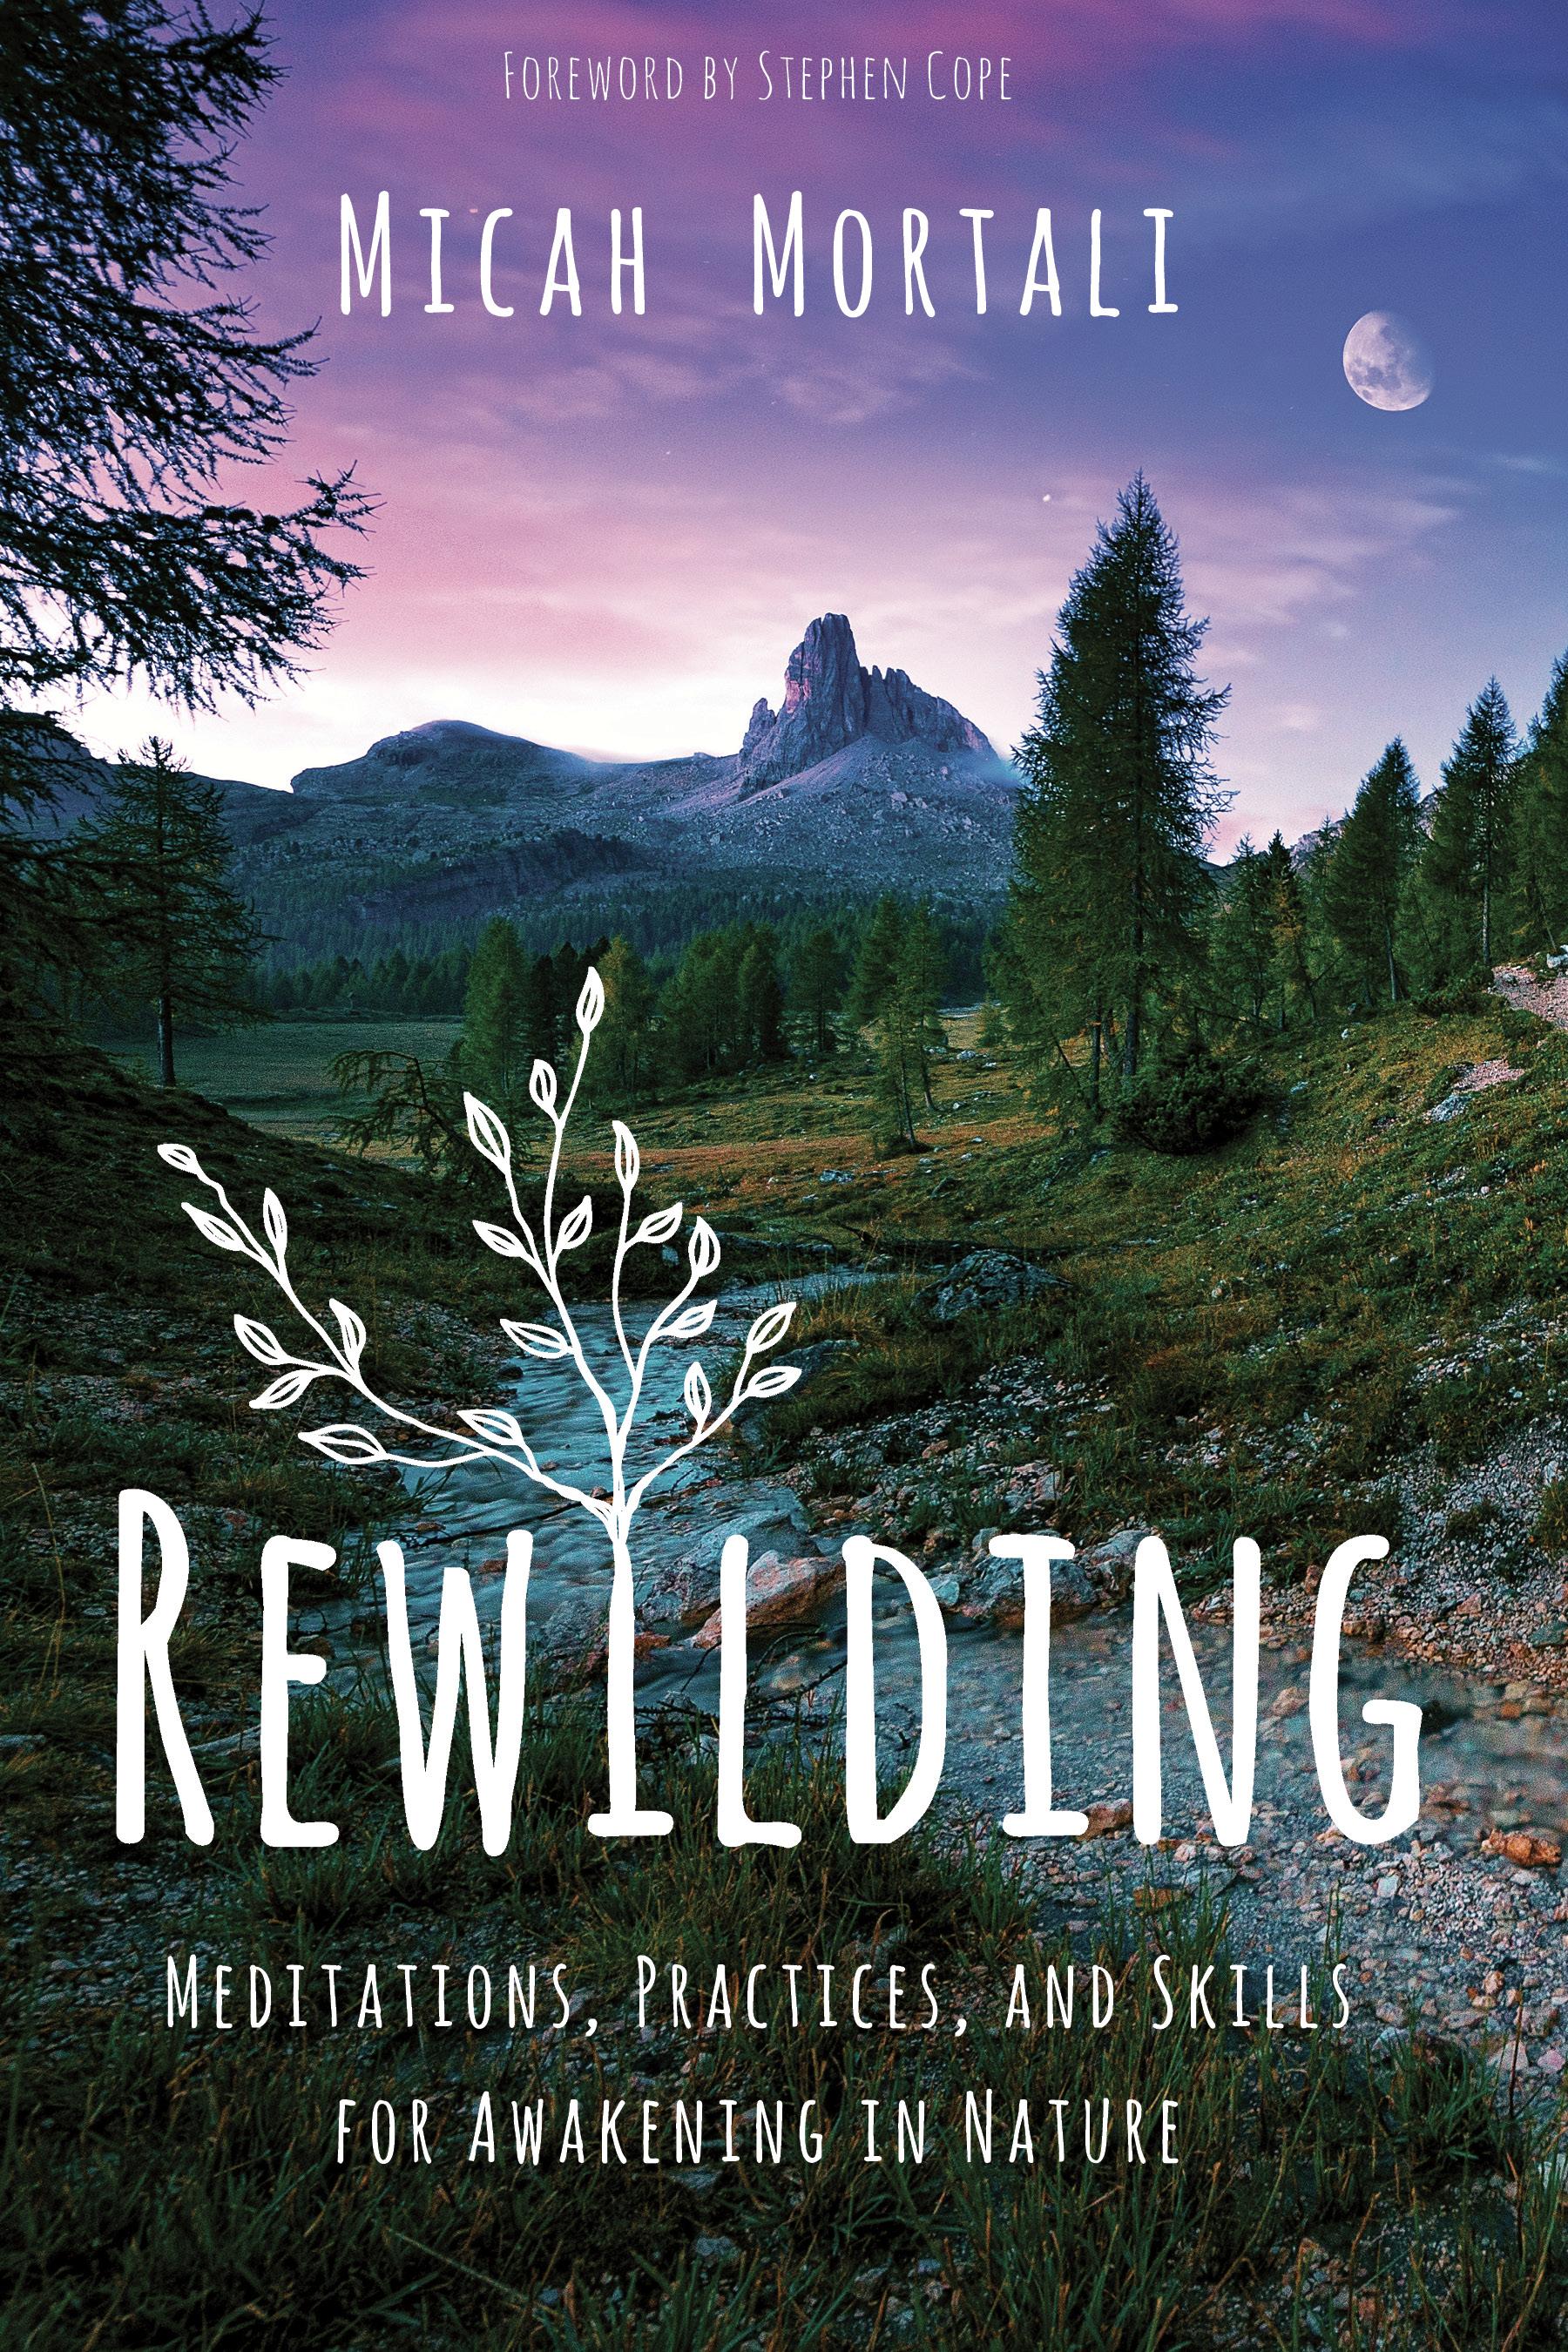 Rewilding Book Cover